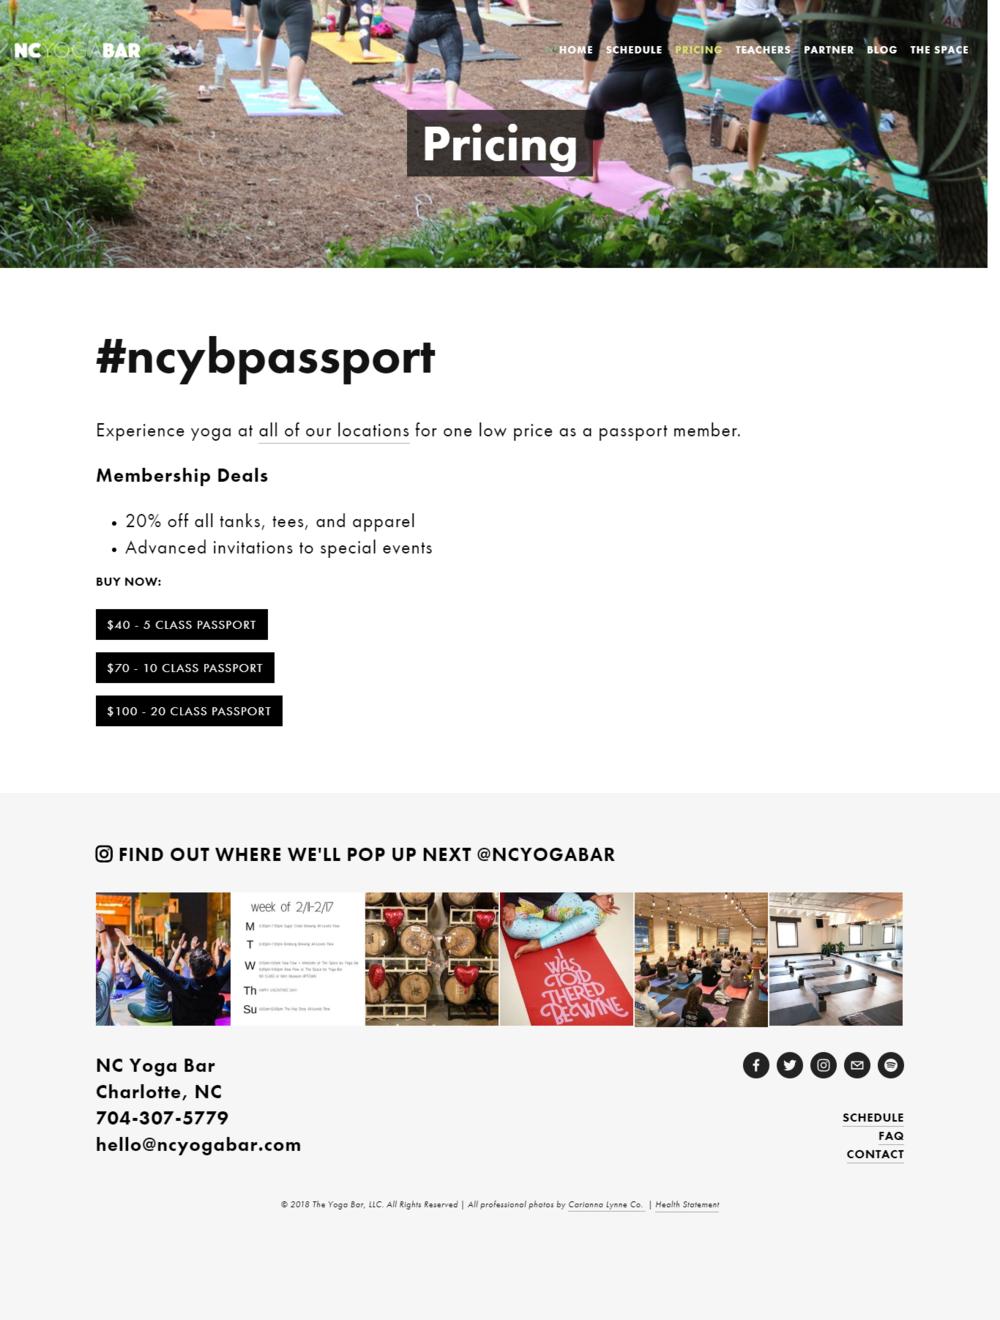 screencapture-ncyogabar-ncybpassport-2019-02-12-22_01_22.png